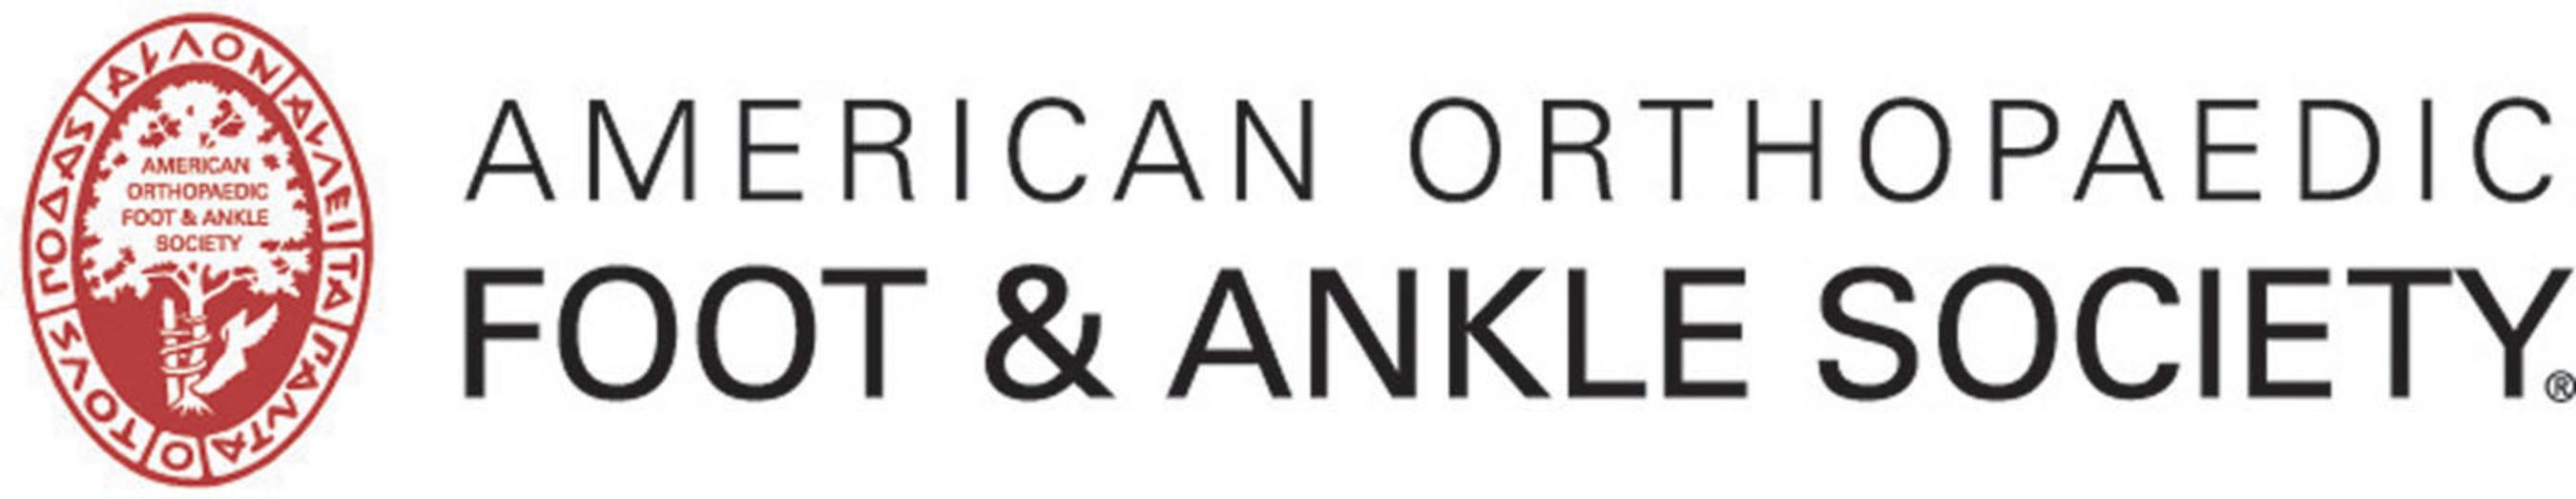 American Orthopaedic Foot & Ankle Society logo. (PRNewsFoto/American Orthopaedic Foot & Ankle Society)